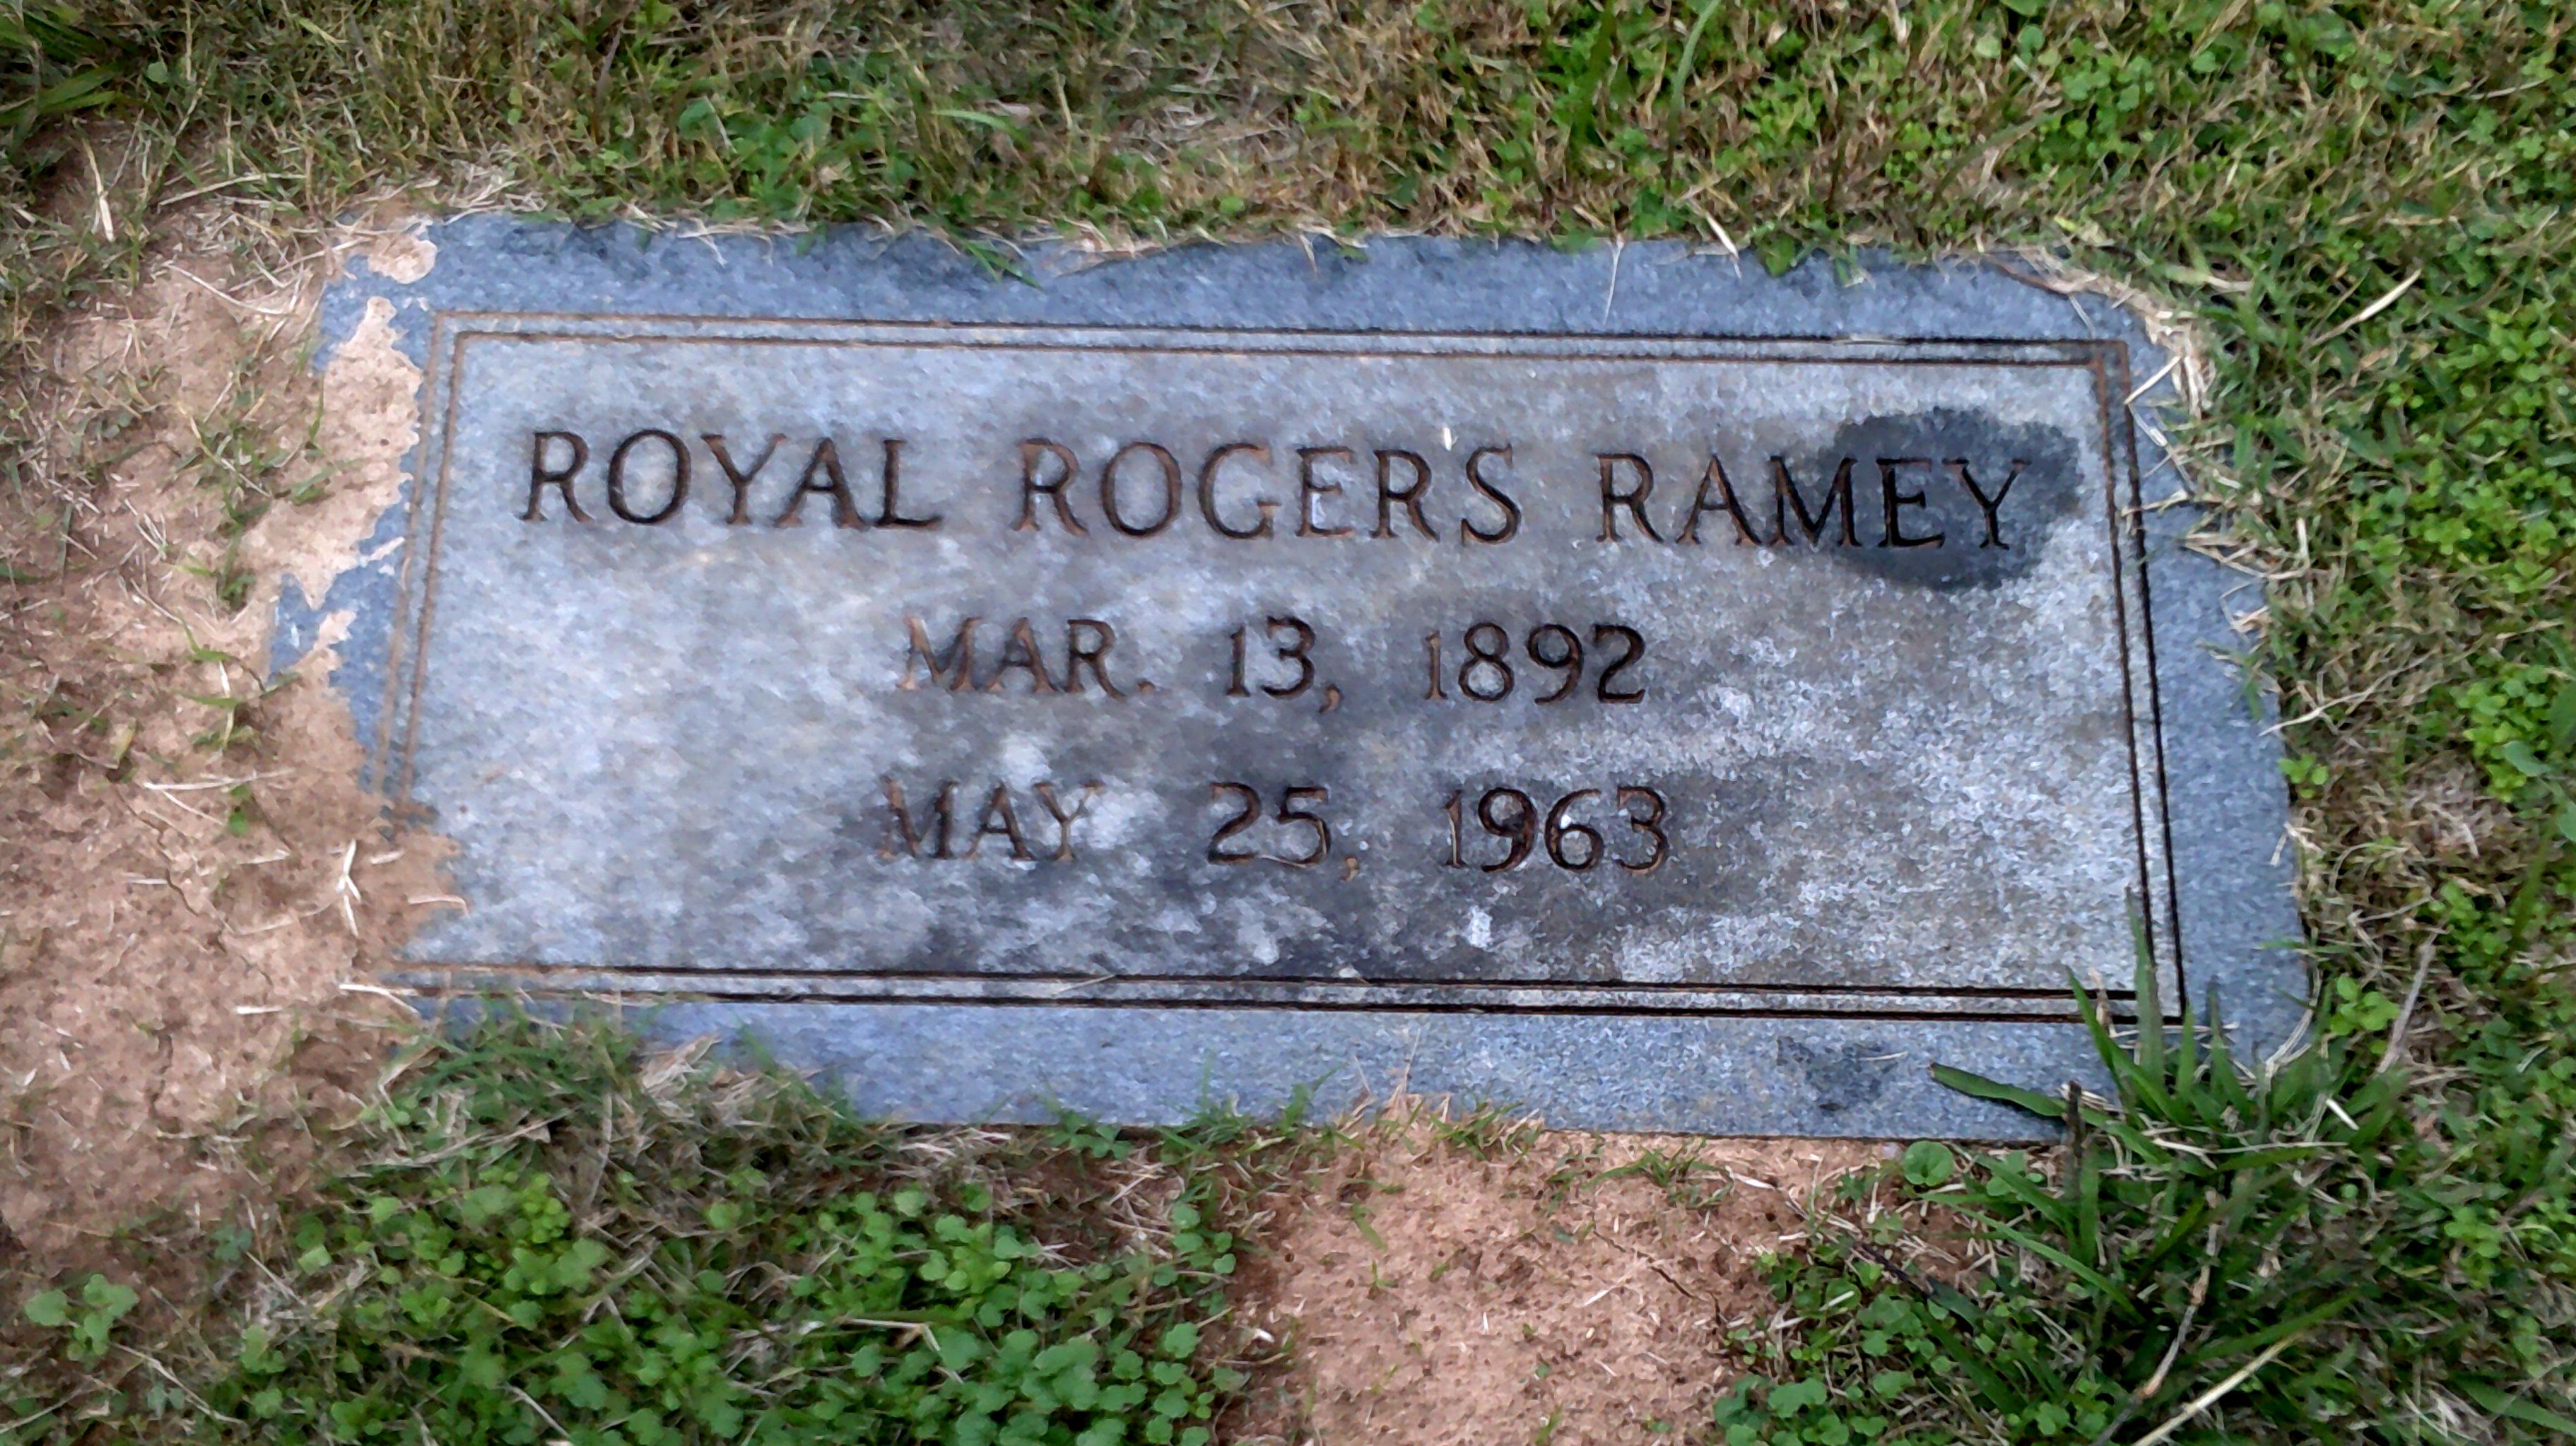 Dr Royal Rogers Ramey